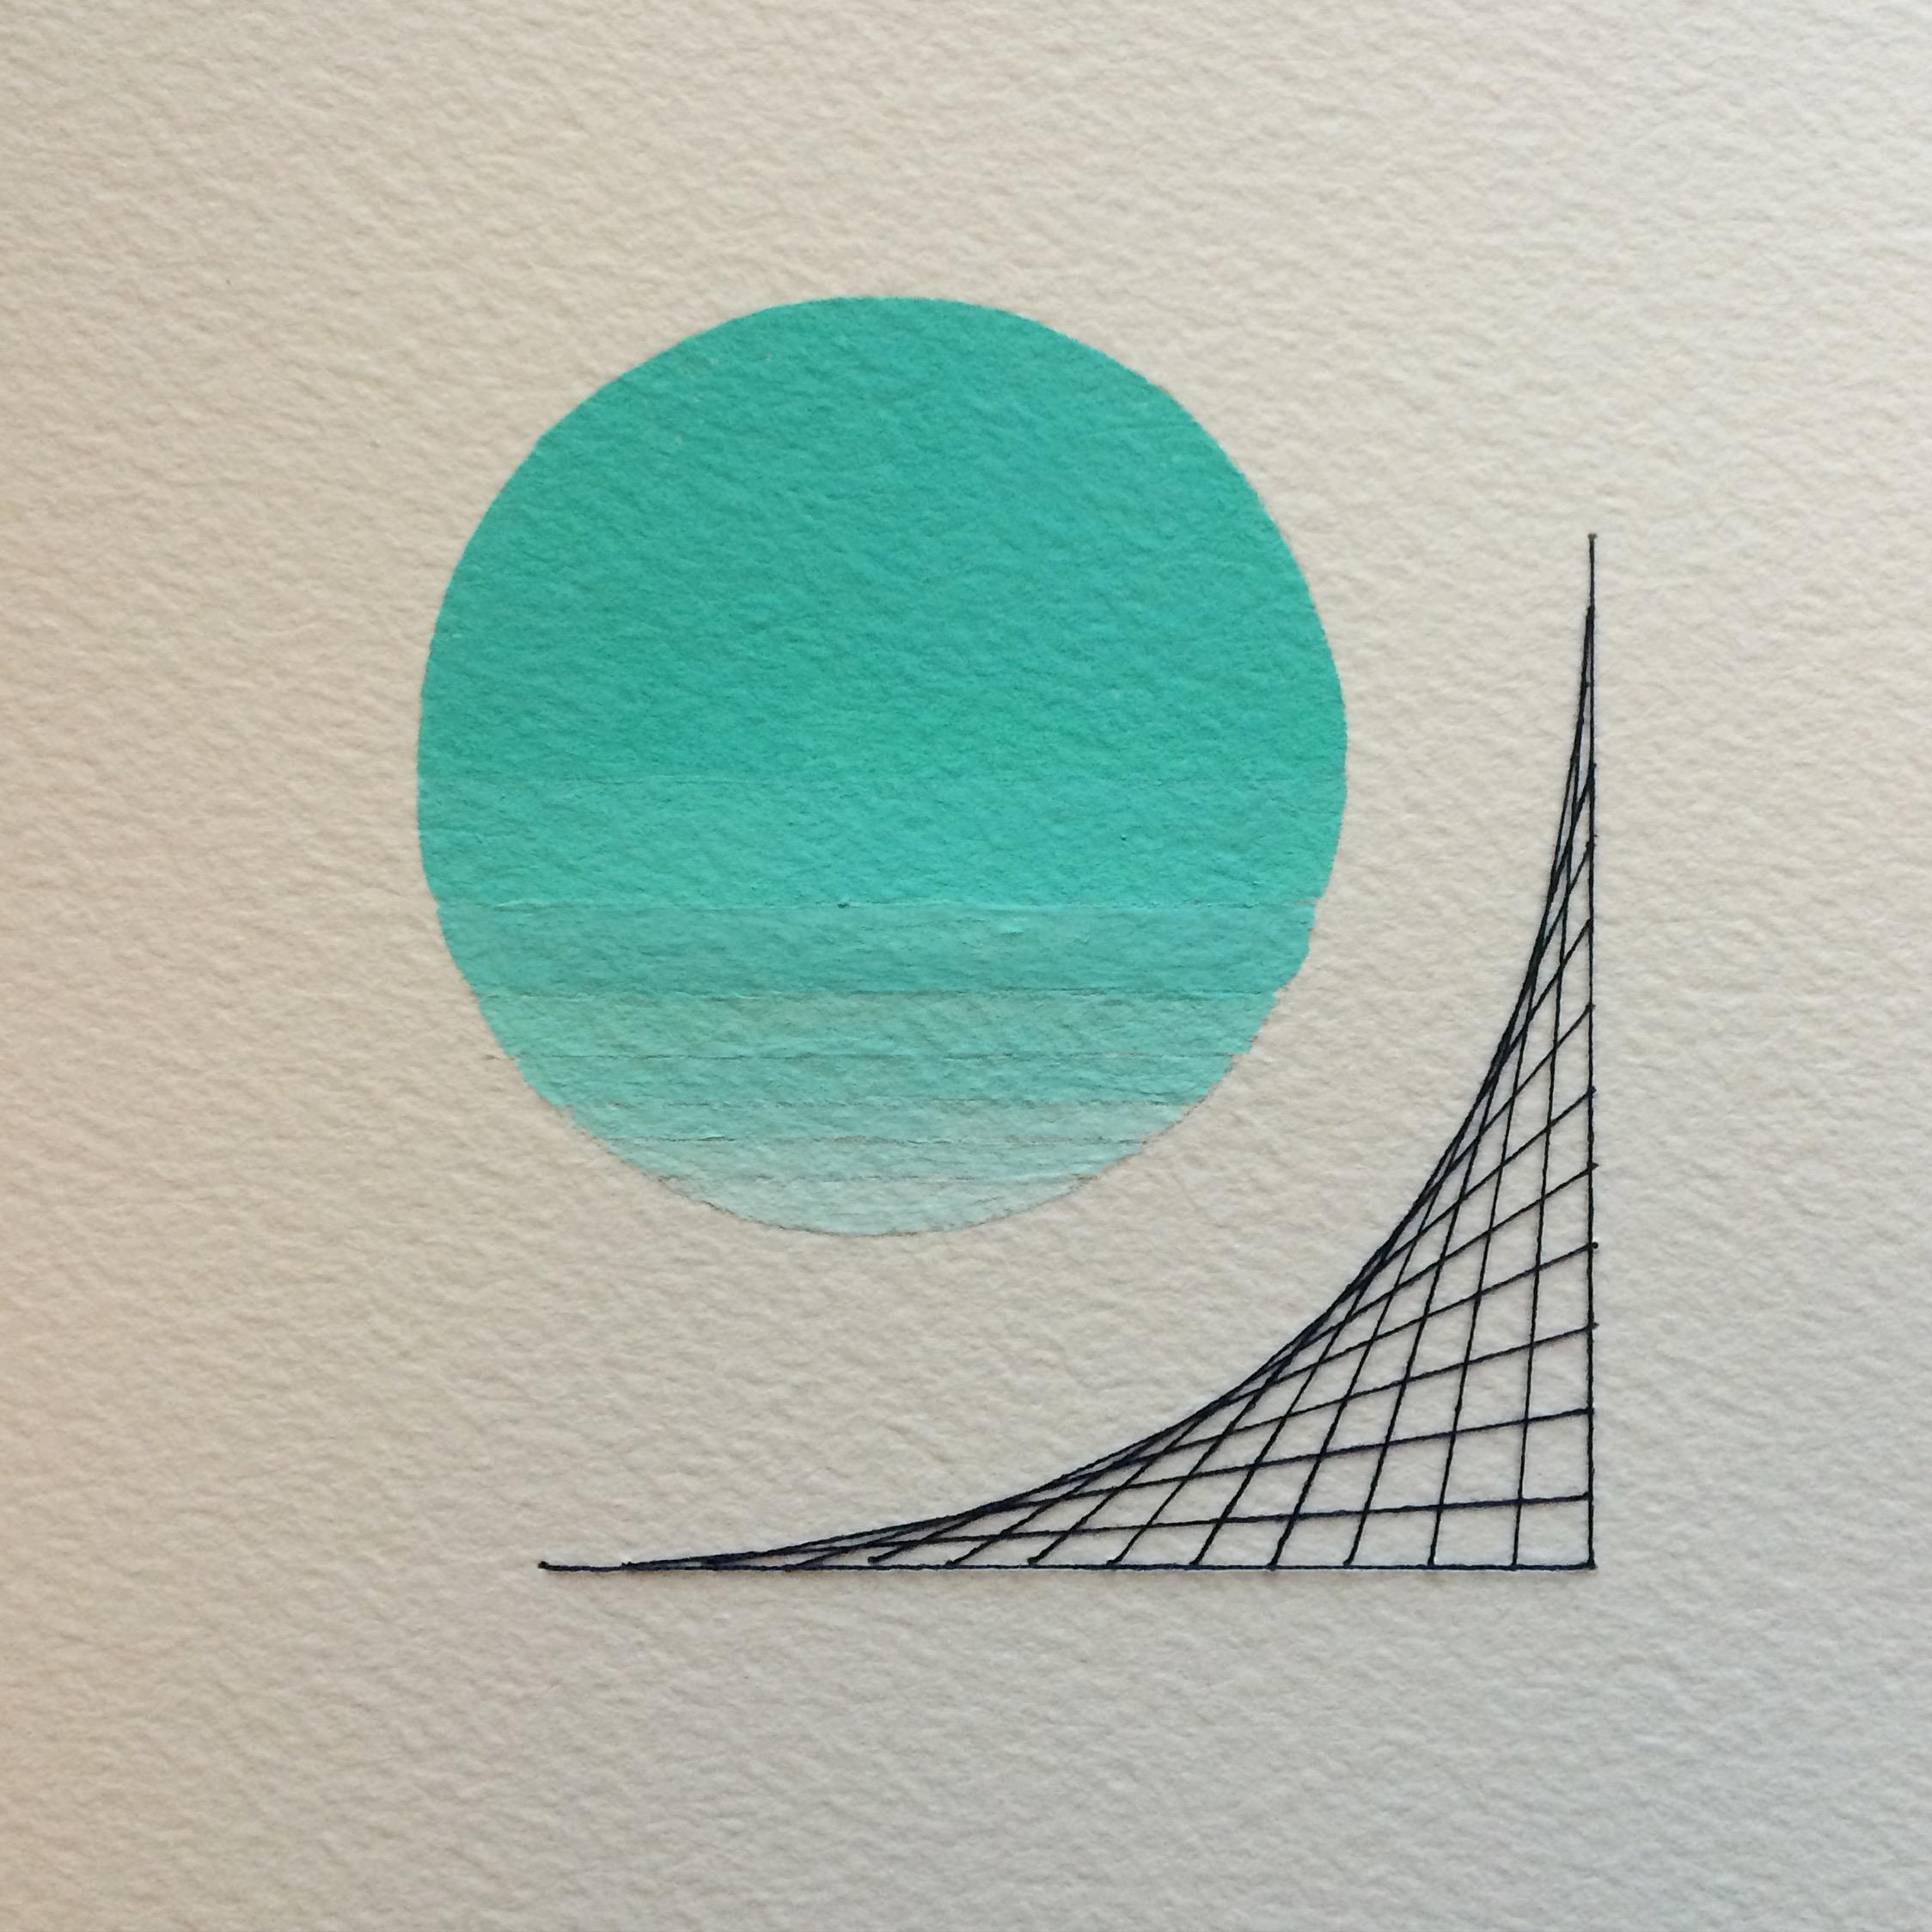 Sara Jones, drawing on paper, 2016.